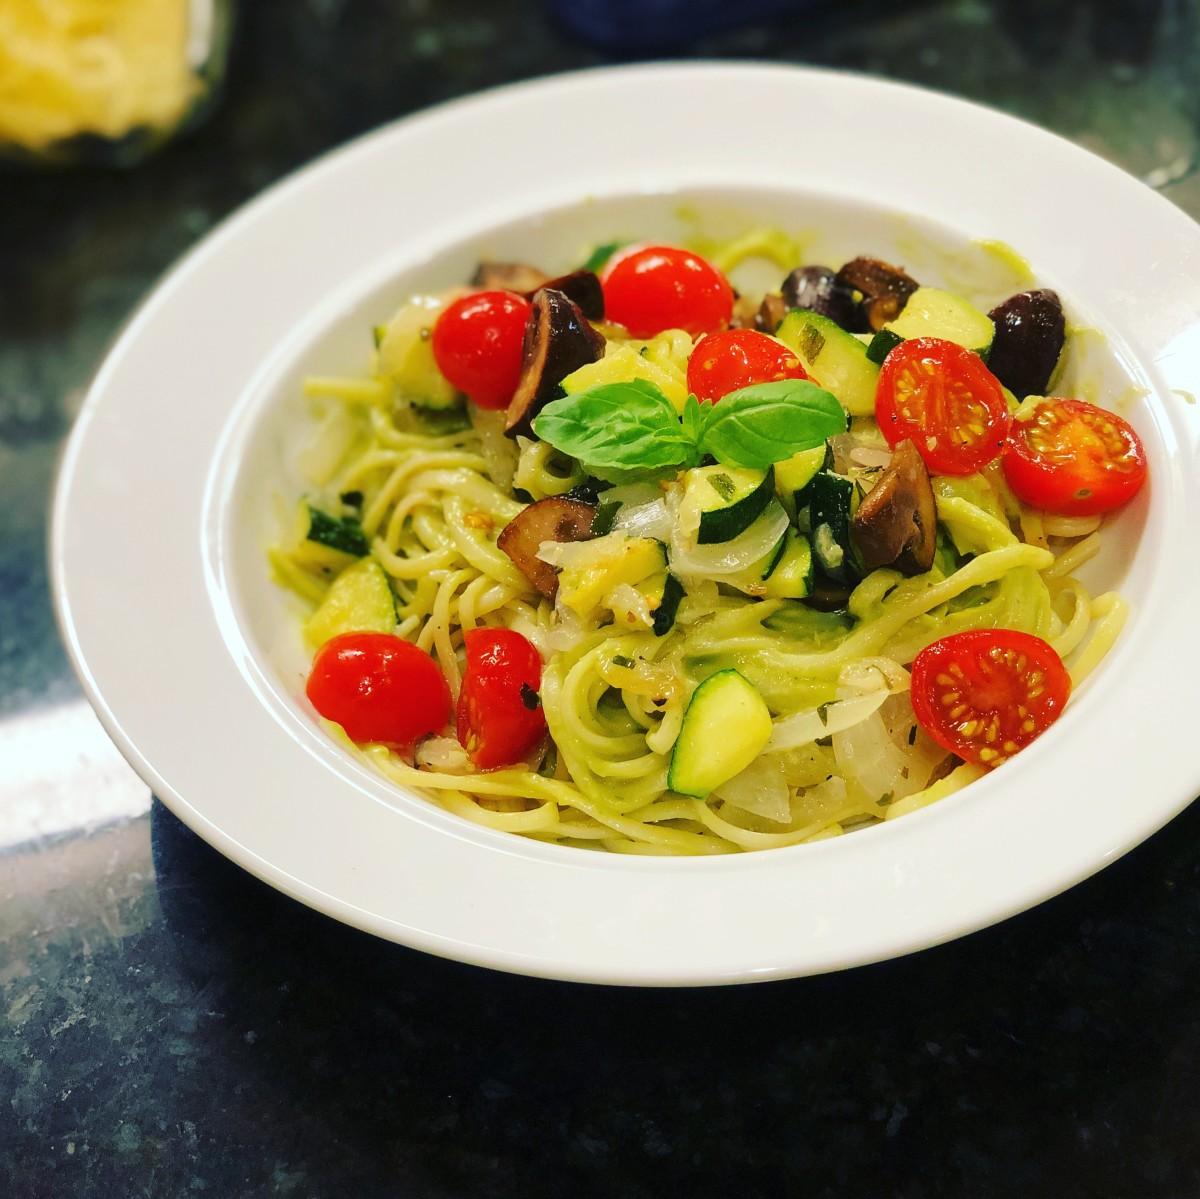 Creamy Avocado Spaghetti